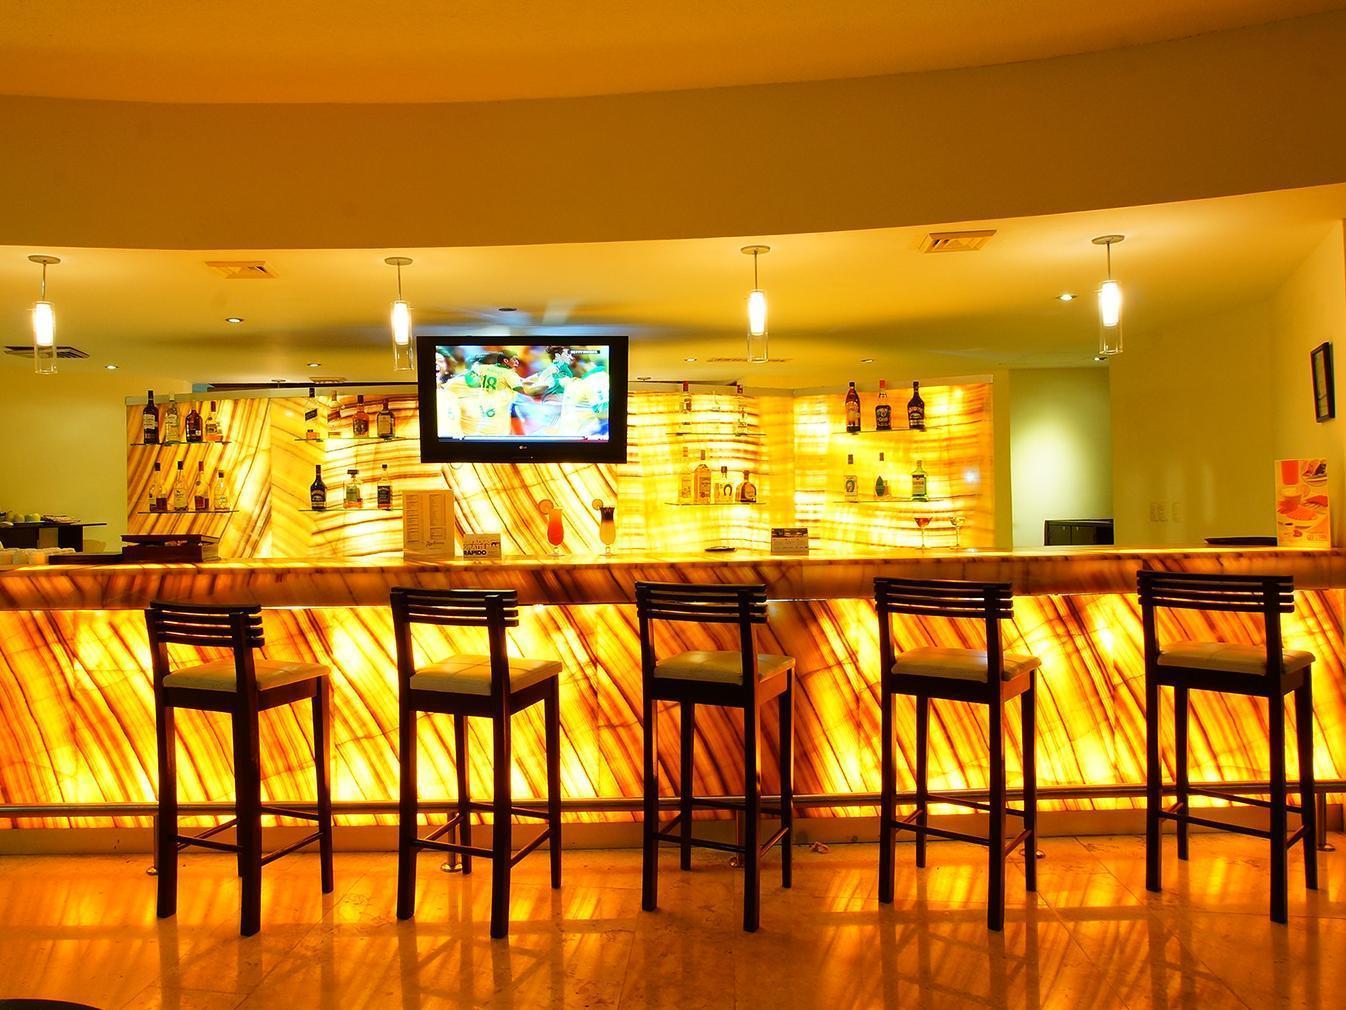 Adhara Hacienda Cancun Hotel Adhara Hacienda Cancun Hotel Top Hotels